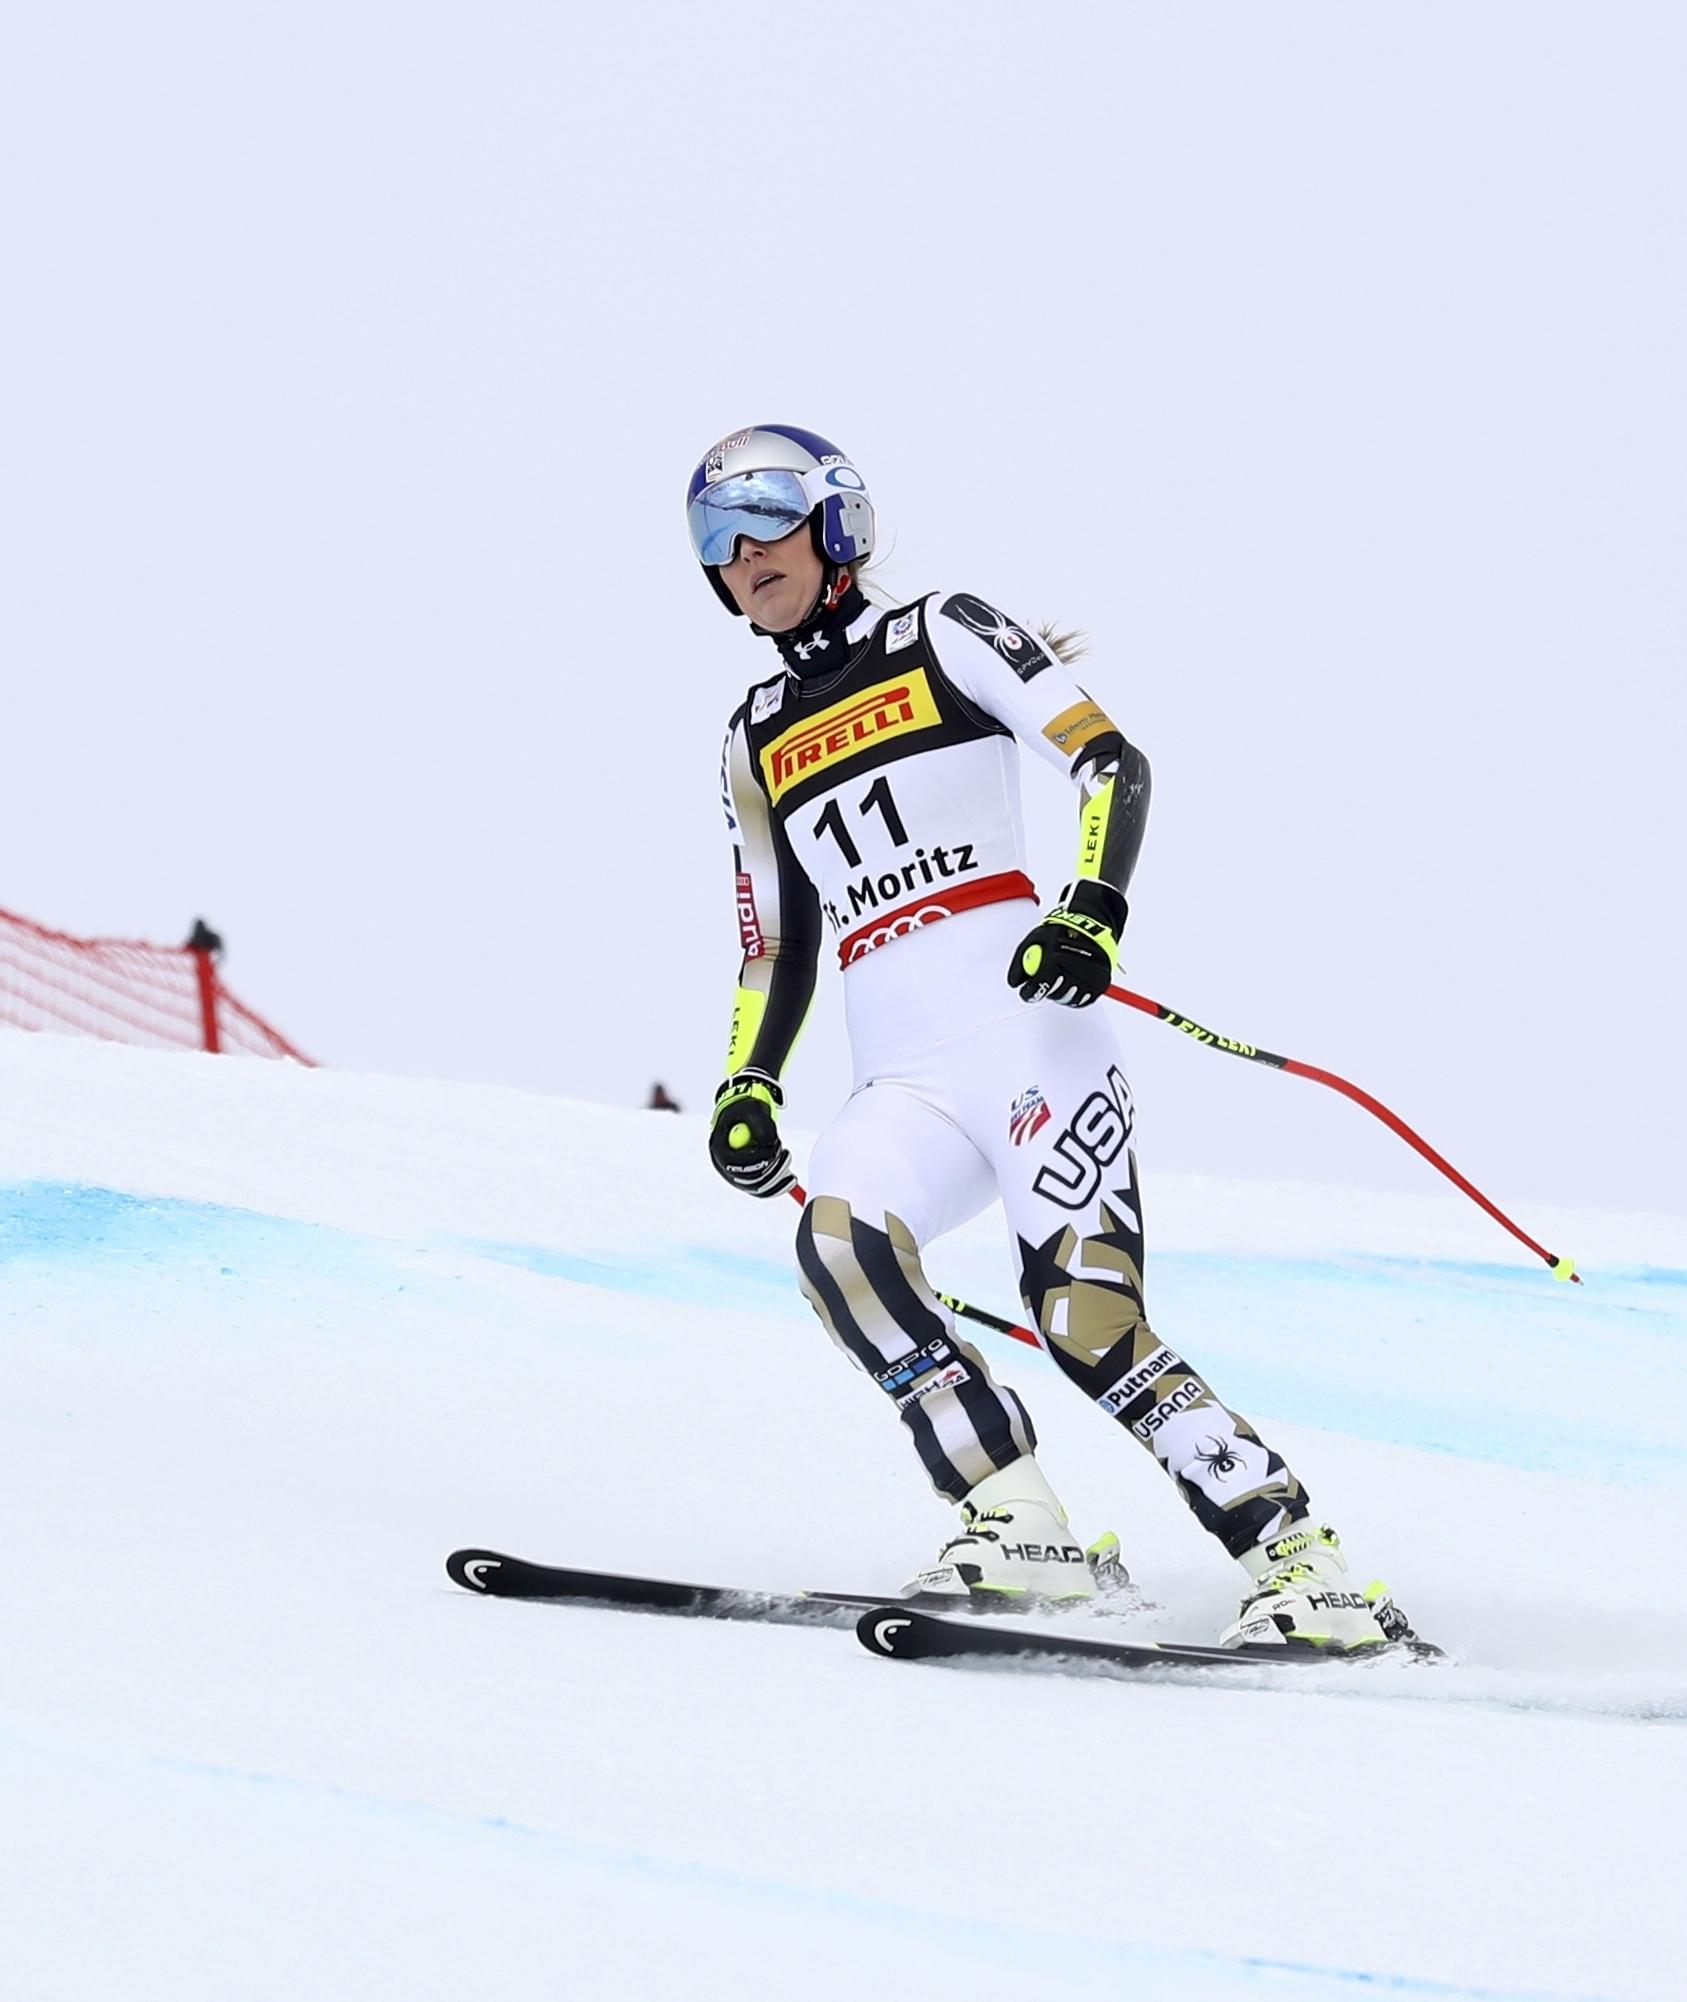 United States's Lindsey Vonn fails to finish a women's super-G, at the Alpine Ski World Championships, in St. Moritz, Switzerland, Tuesday, Feb. 7, 2017. (AP Photo/Alessandro Trovati)